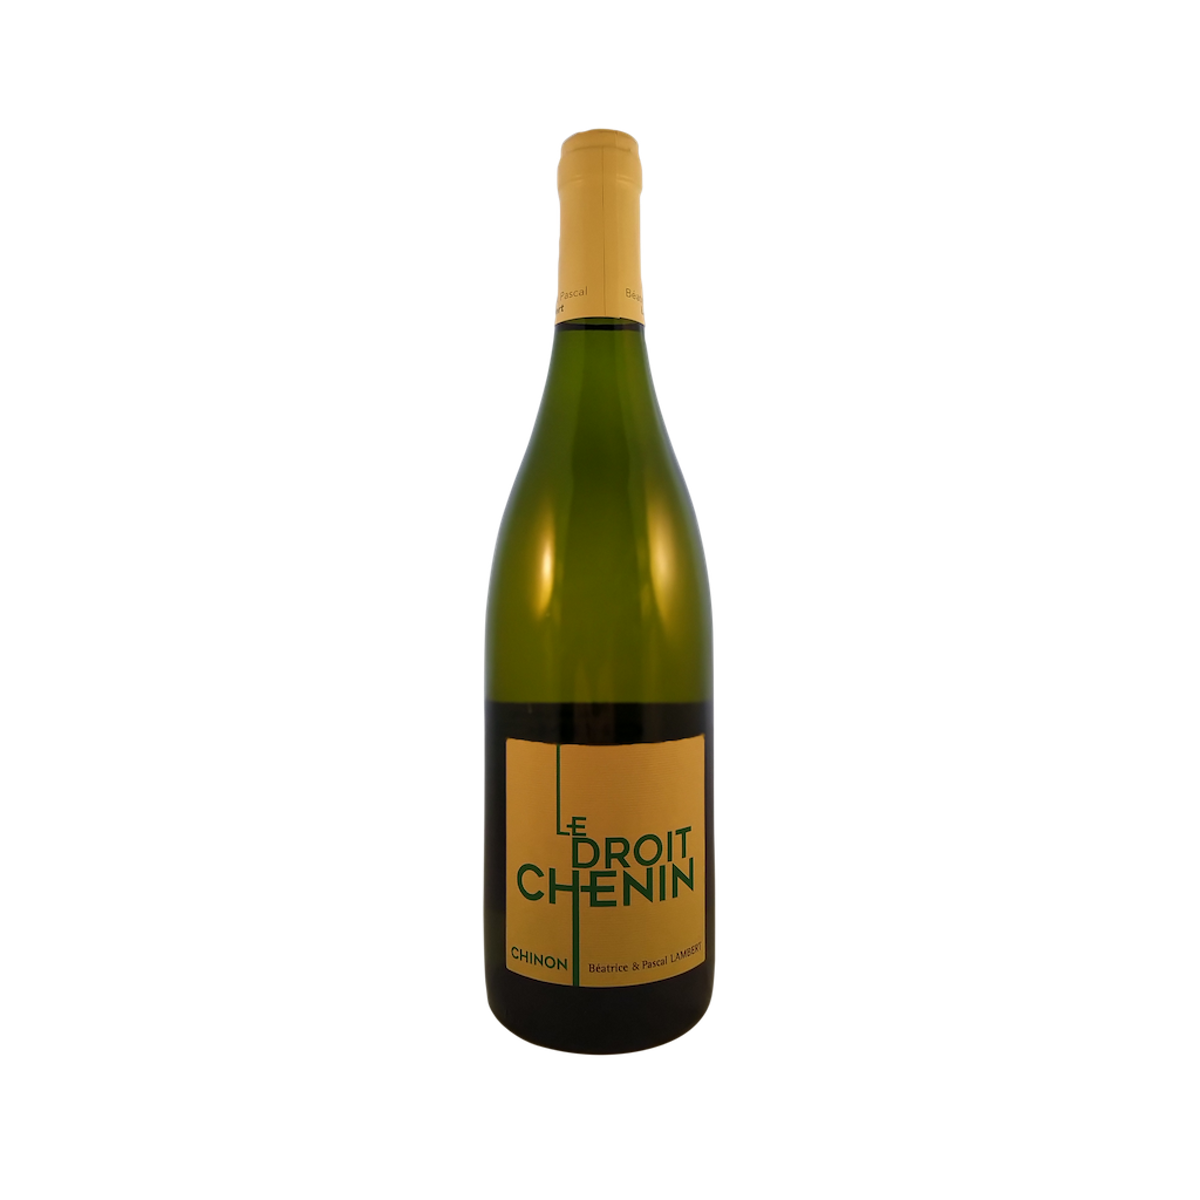 Chinon Blanc 'Le Droit Chenin', 2020